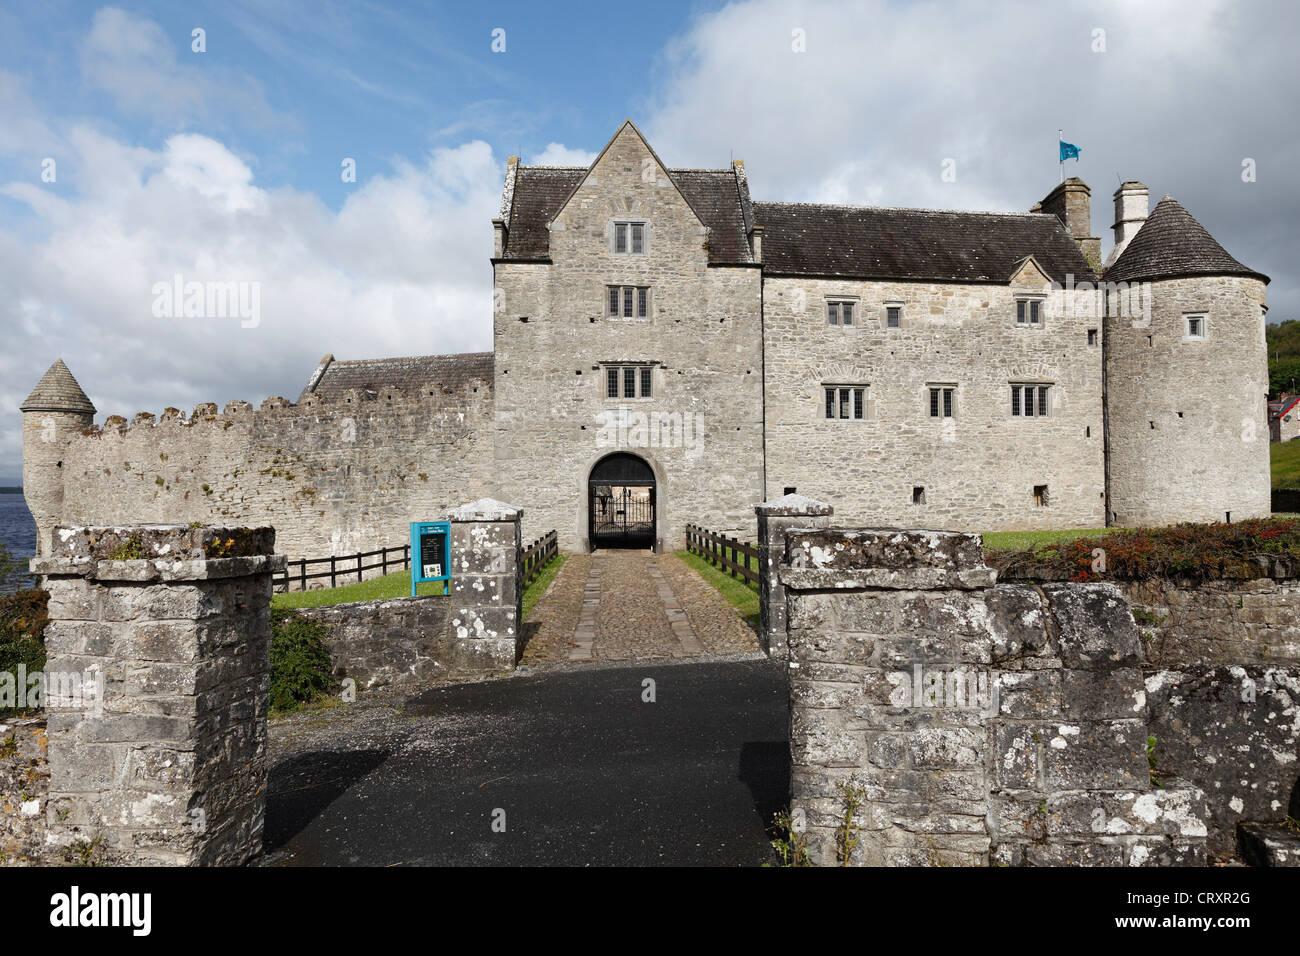 Ireland, Connacht, County Leitrim, View of Parke's Castle - Stock Image